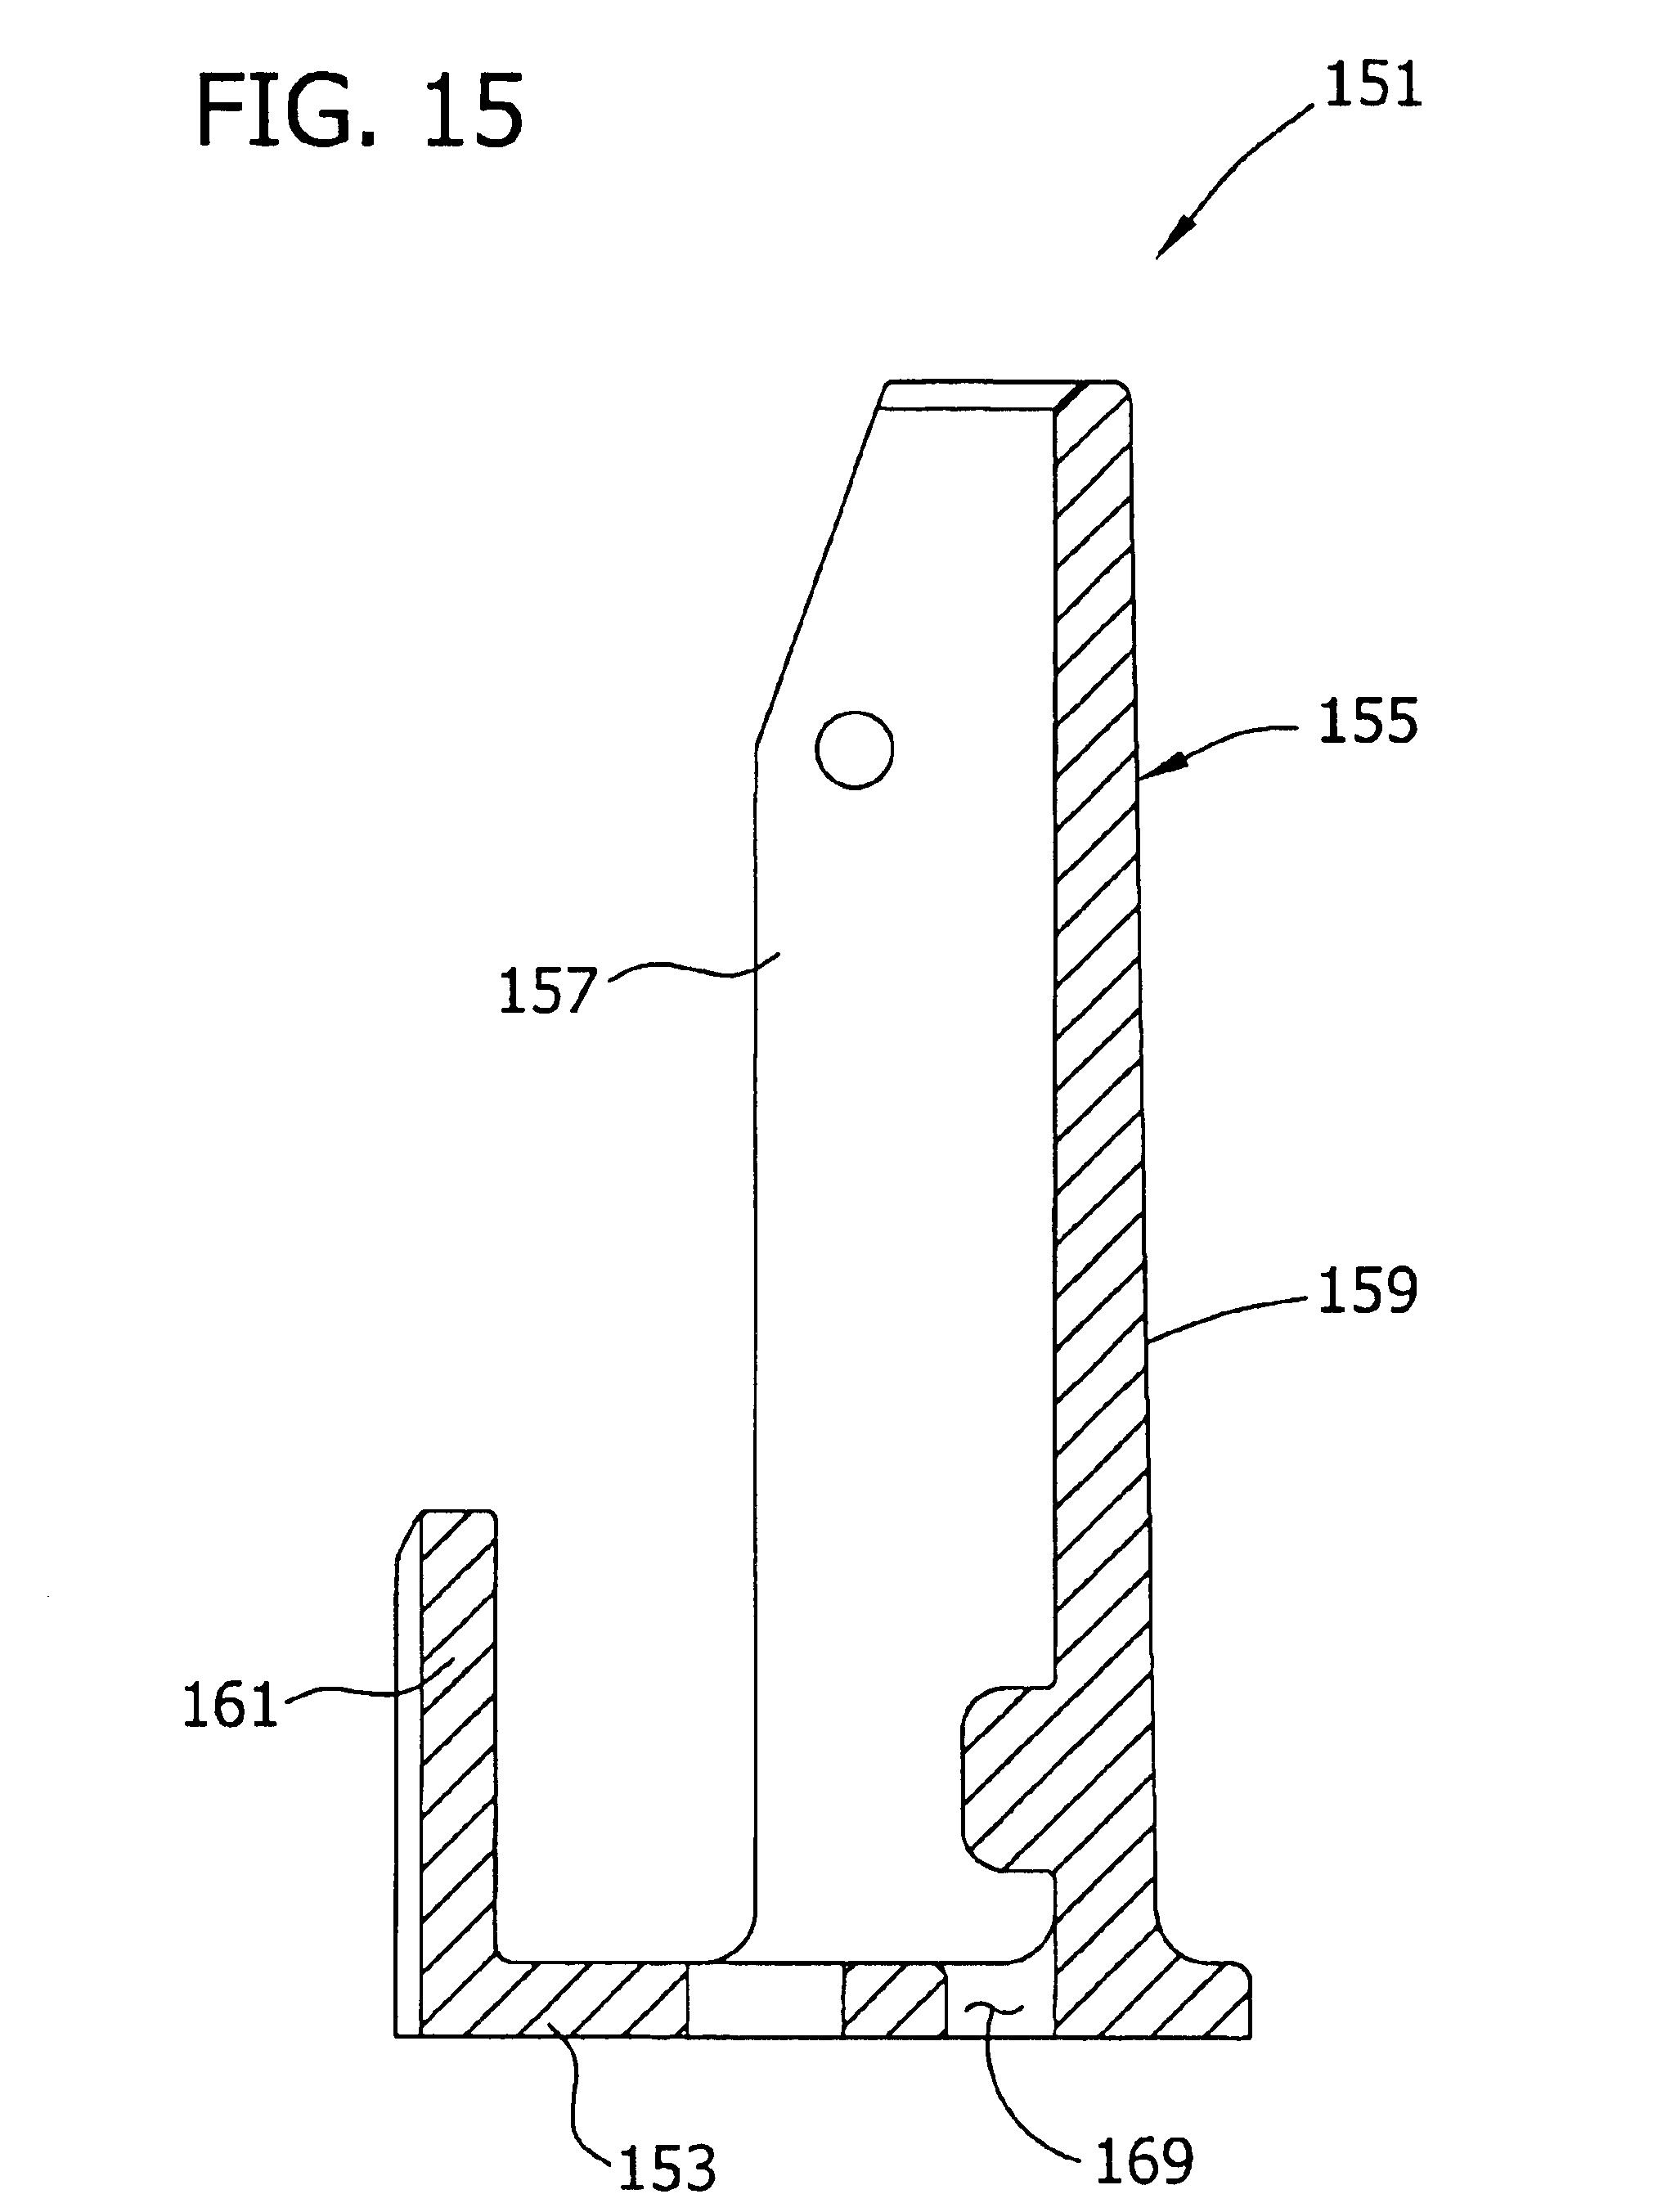 Milbank Meter Base Wiring Diagram Outback Power Wiring Diagram